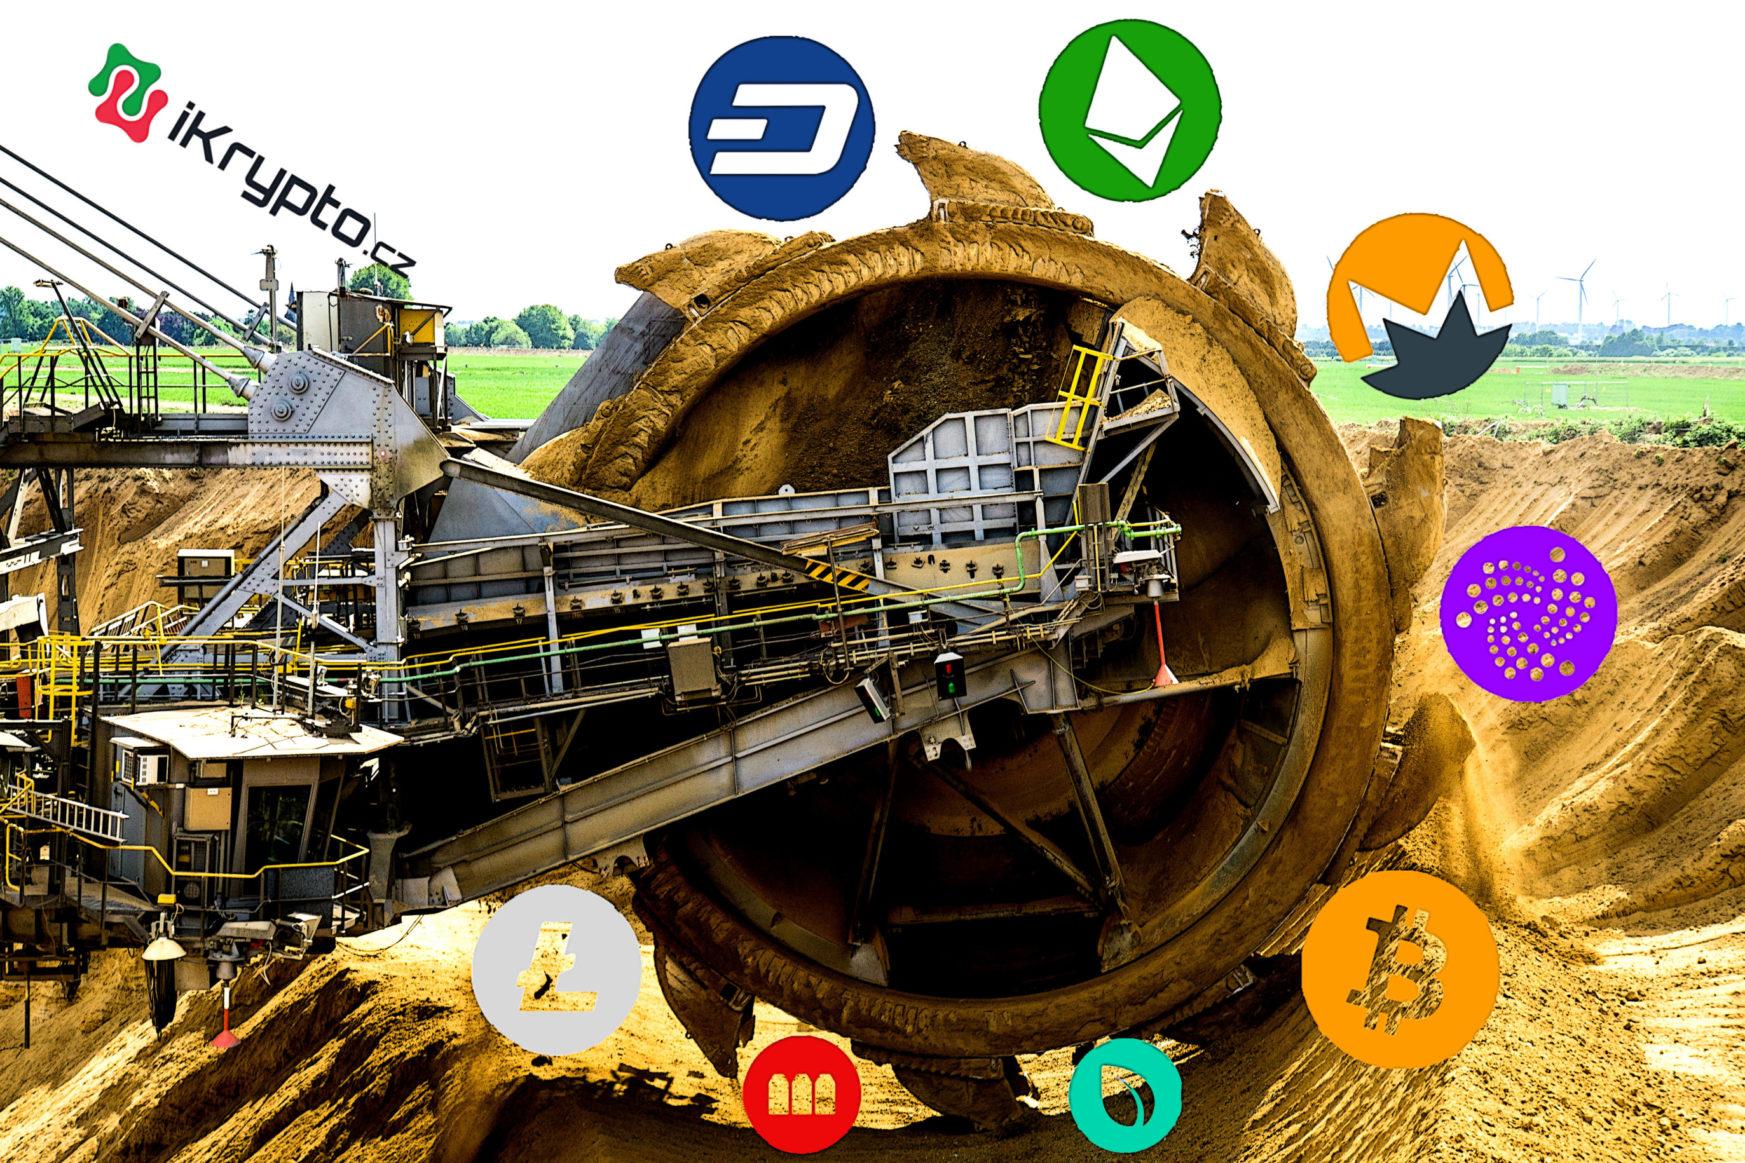 tezba kryptomen